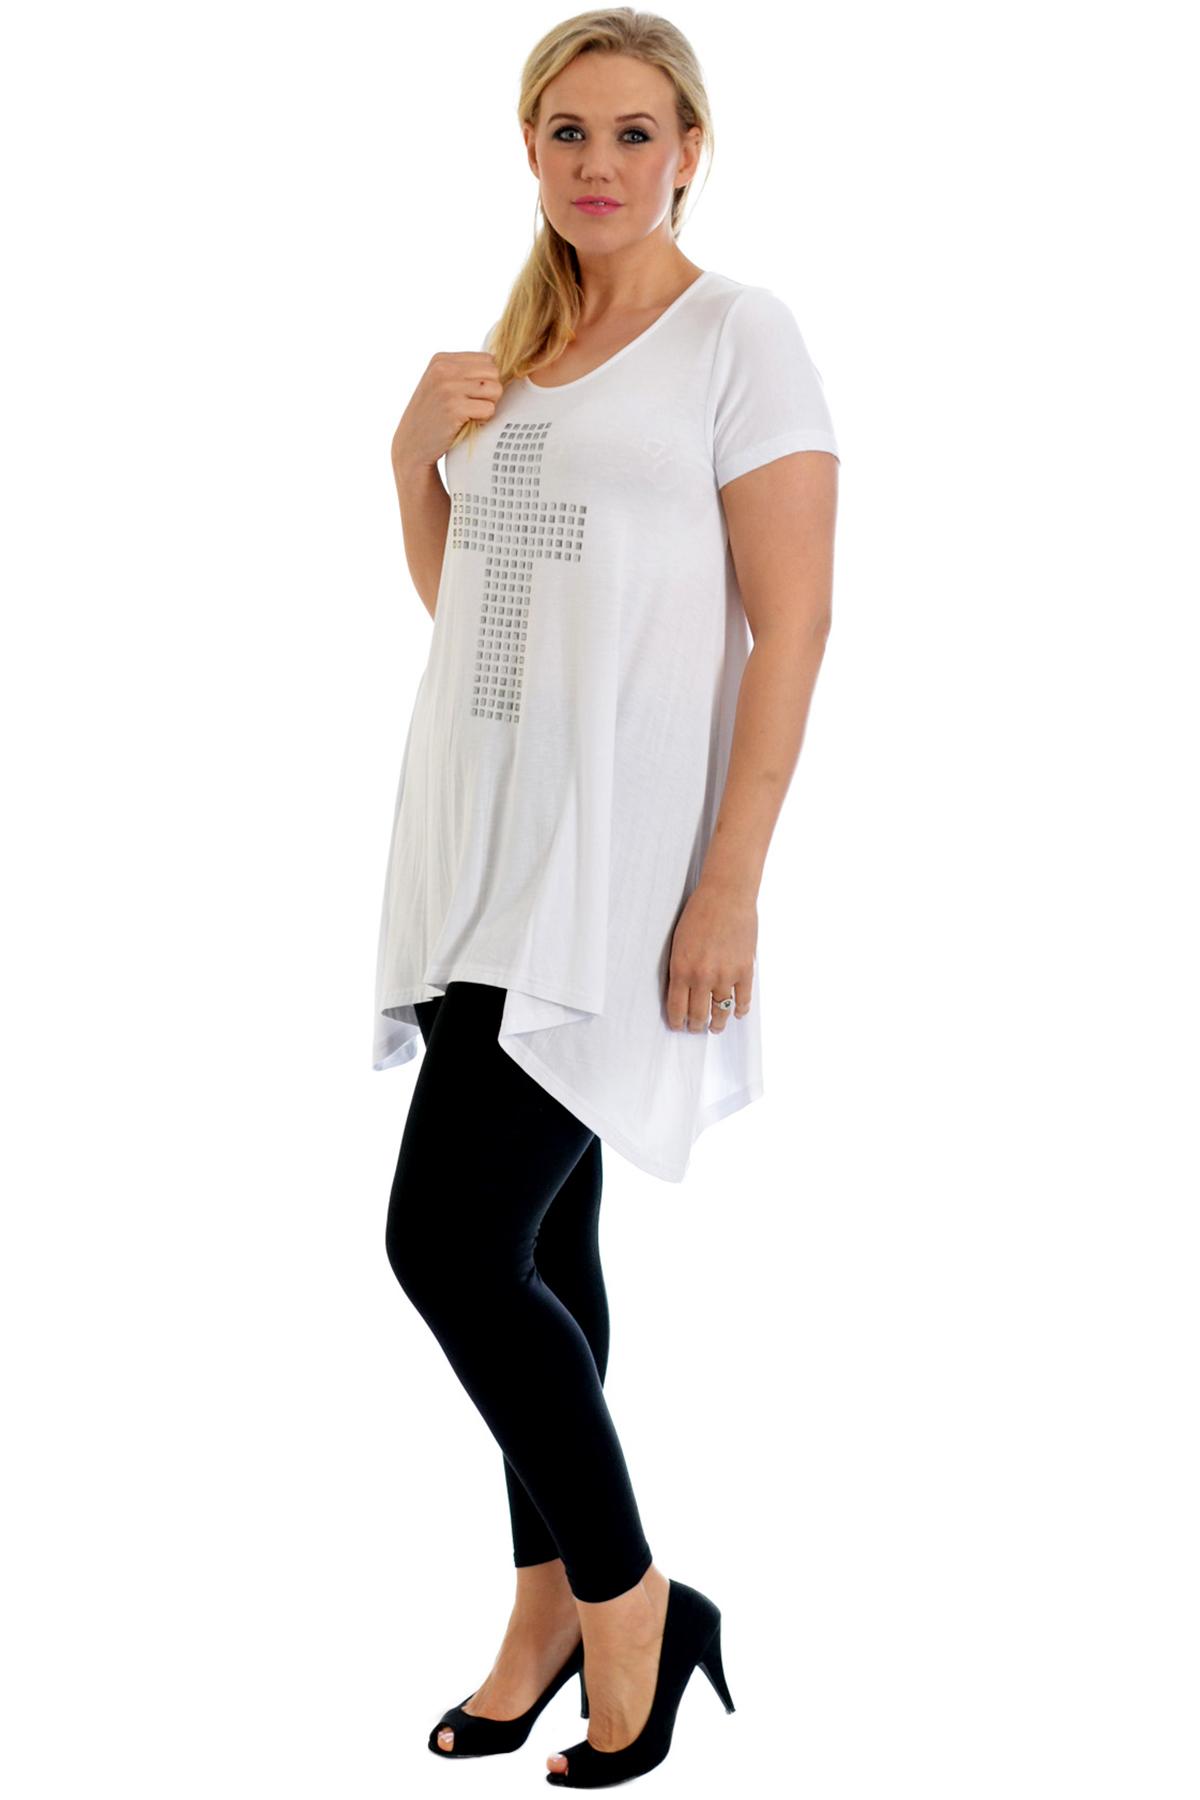 New Womens Top Plus Size Ladies Cross Stud T-Shirt A-Line Gothic Party Nouvelle